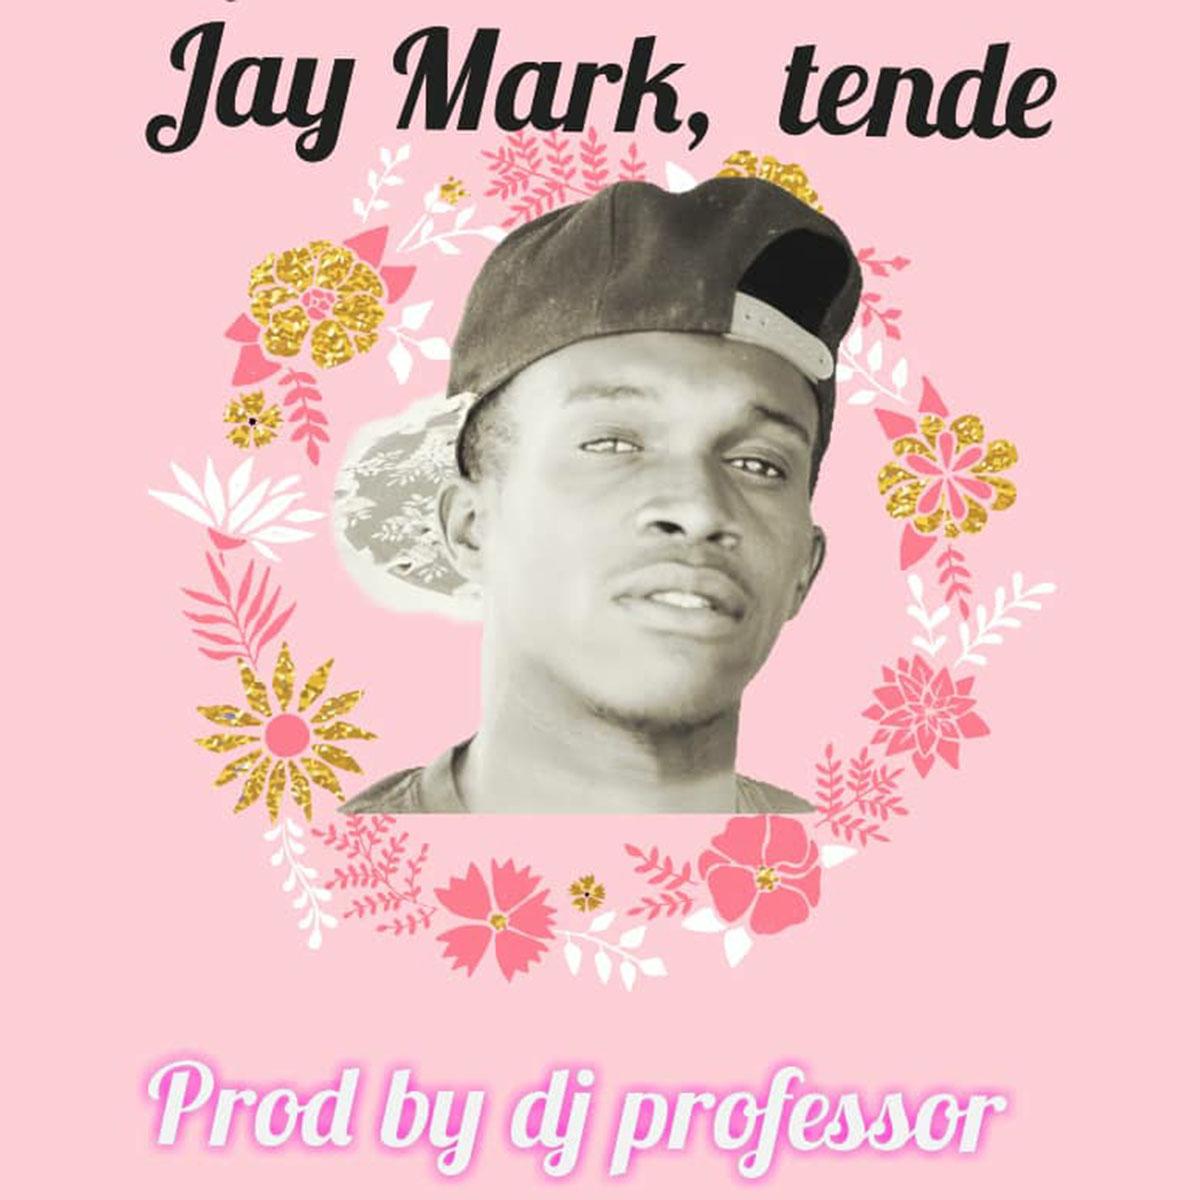 Jay Mark - Tende (Prod. DJ Professor)